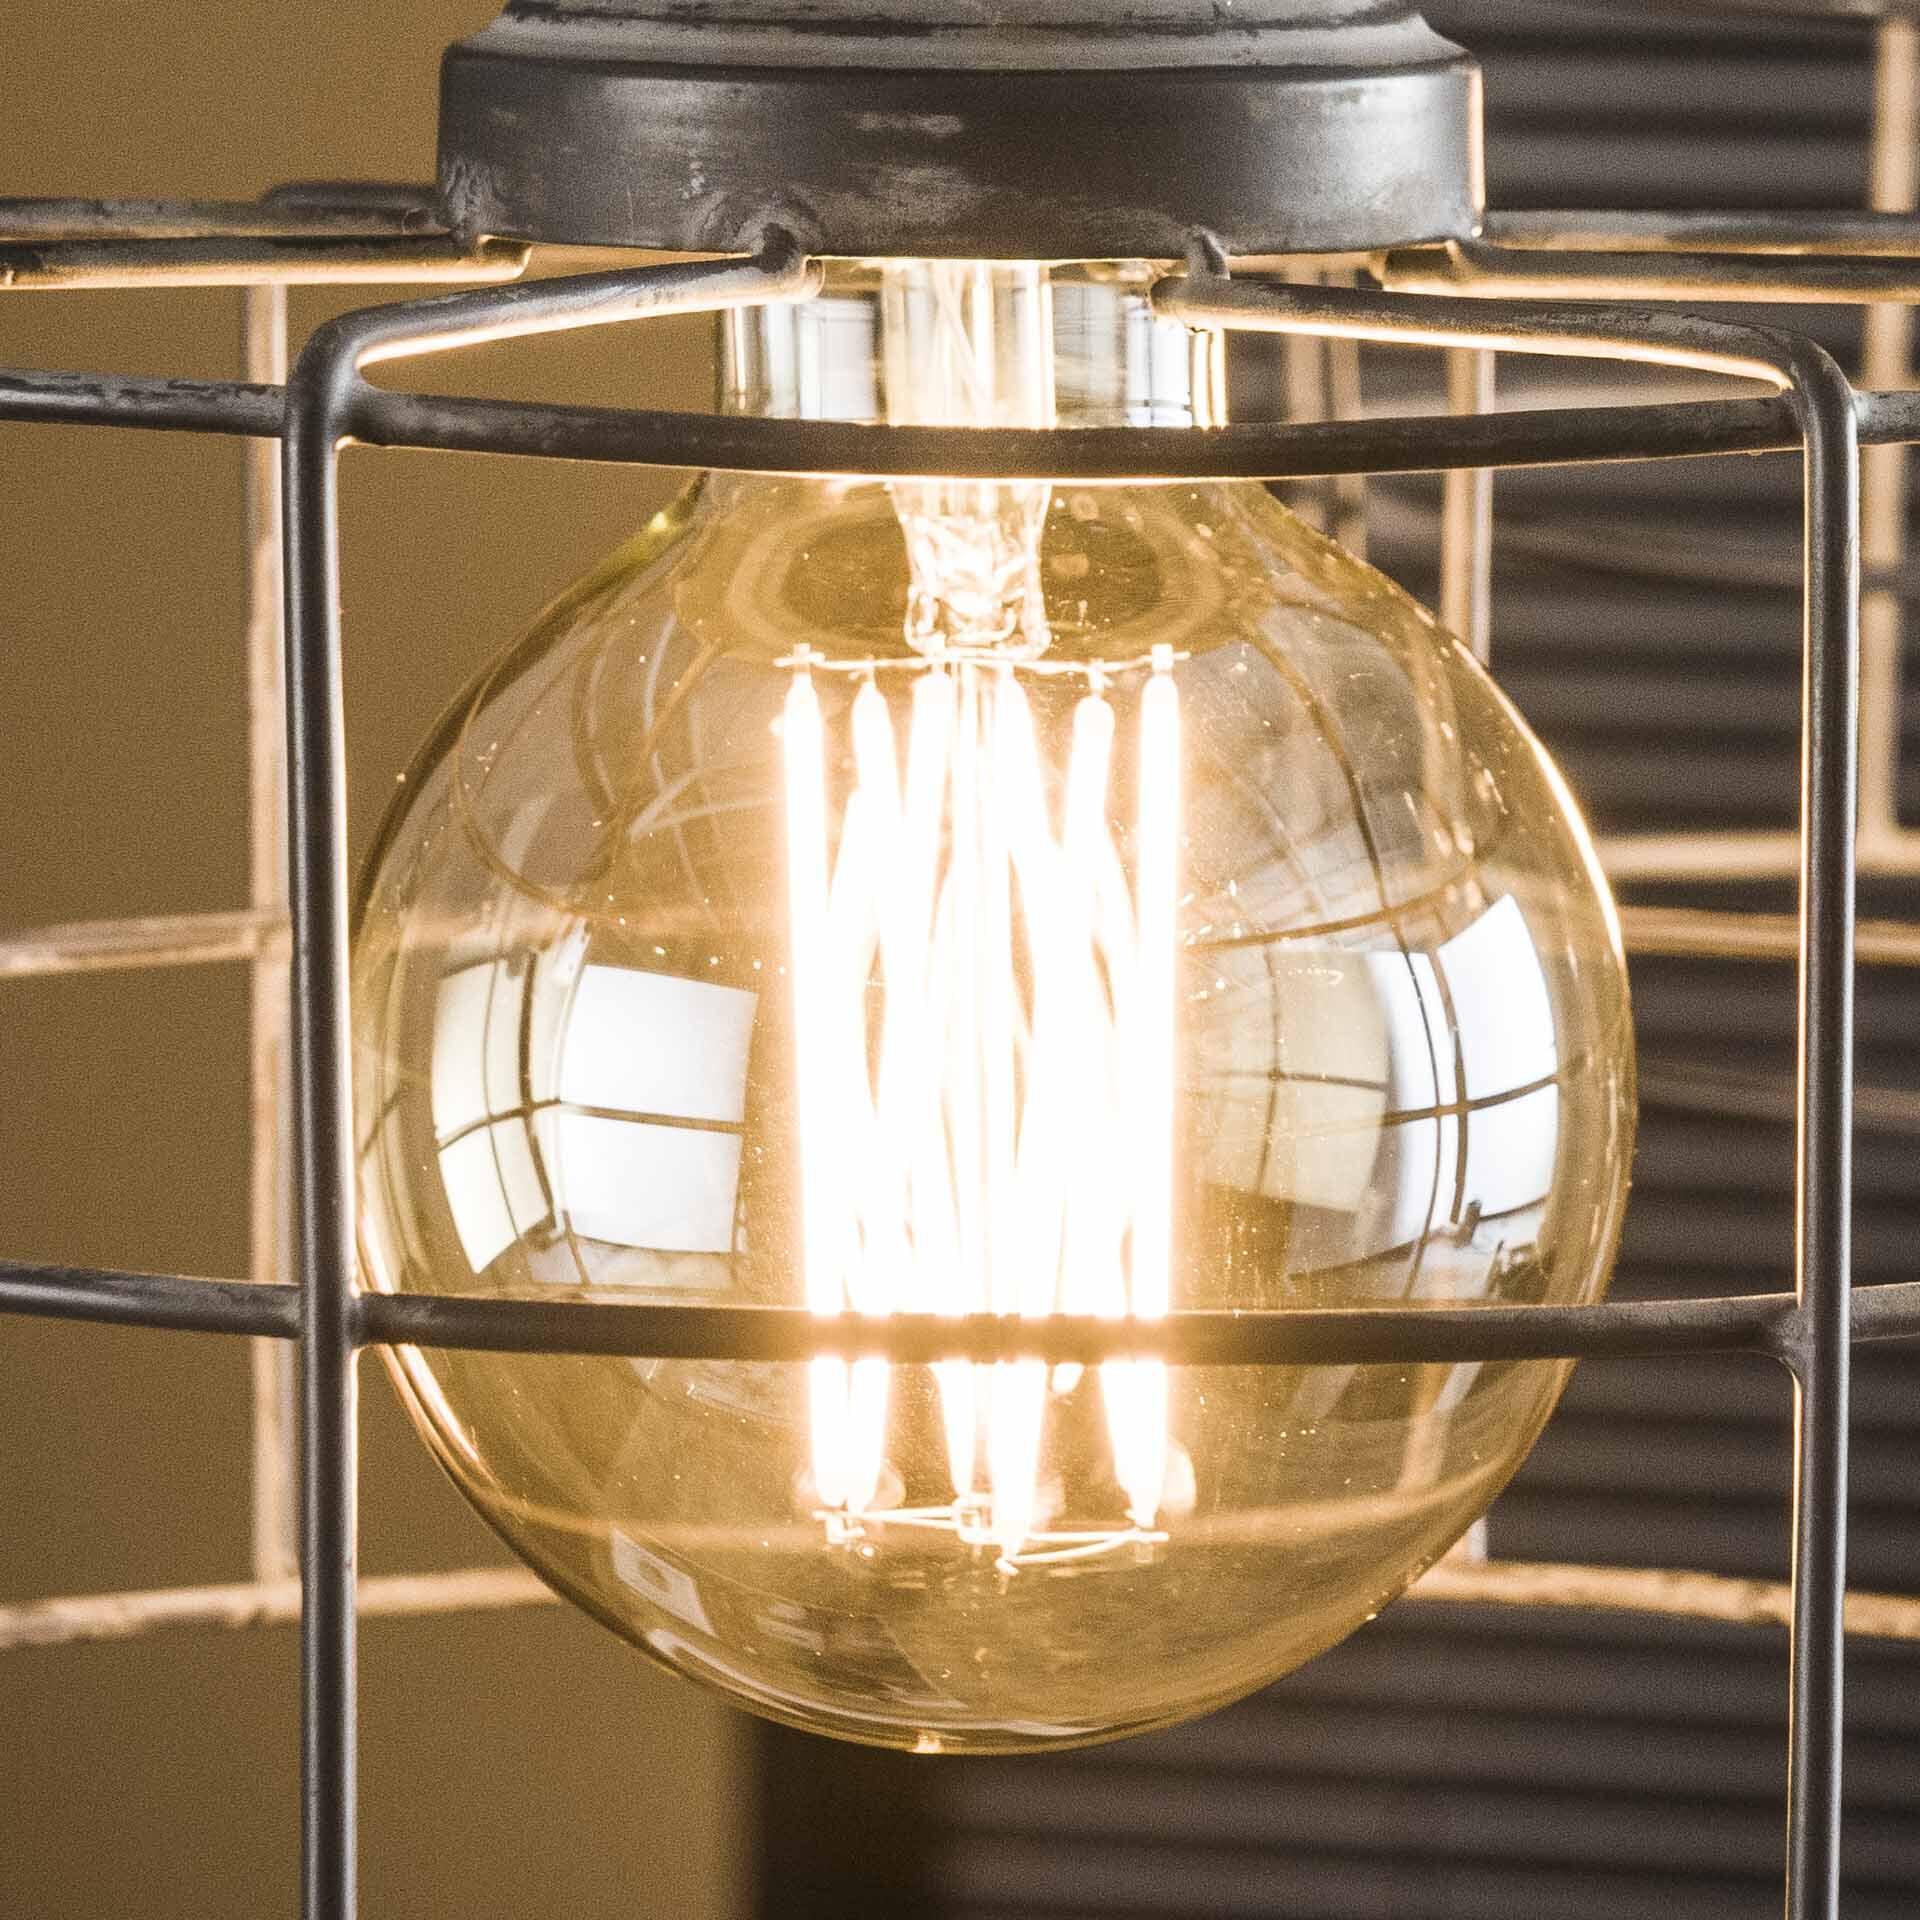 Kooldraadlamp 'Lydia' E27 LED 6W Ø9cm, kleur Amber, dimbaar